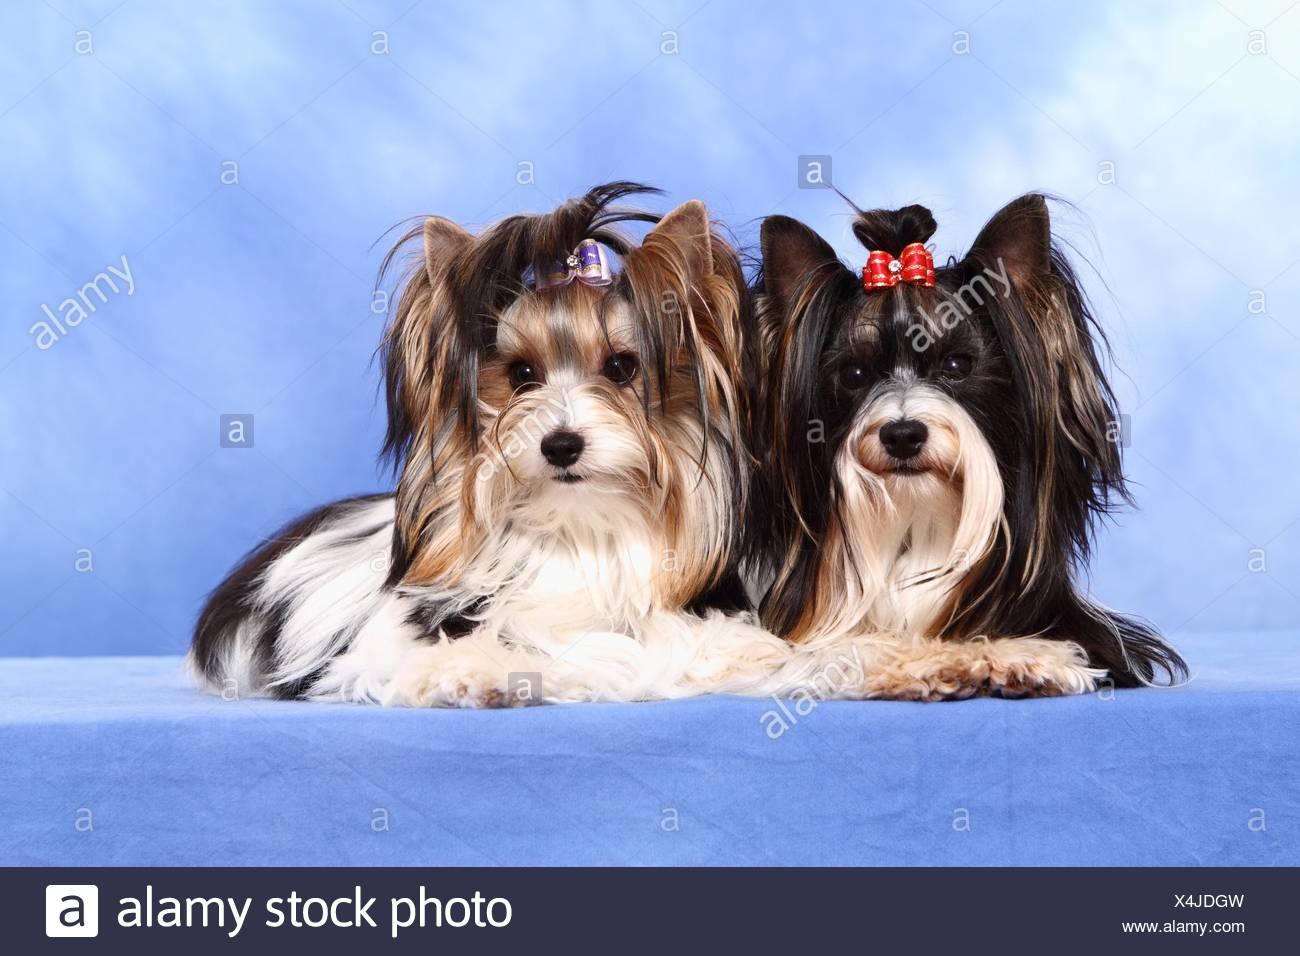 2 Biewer Yorkshire Terriers - Stock Image